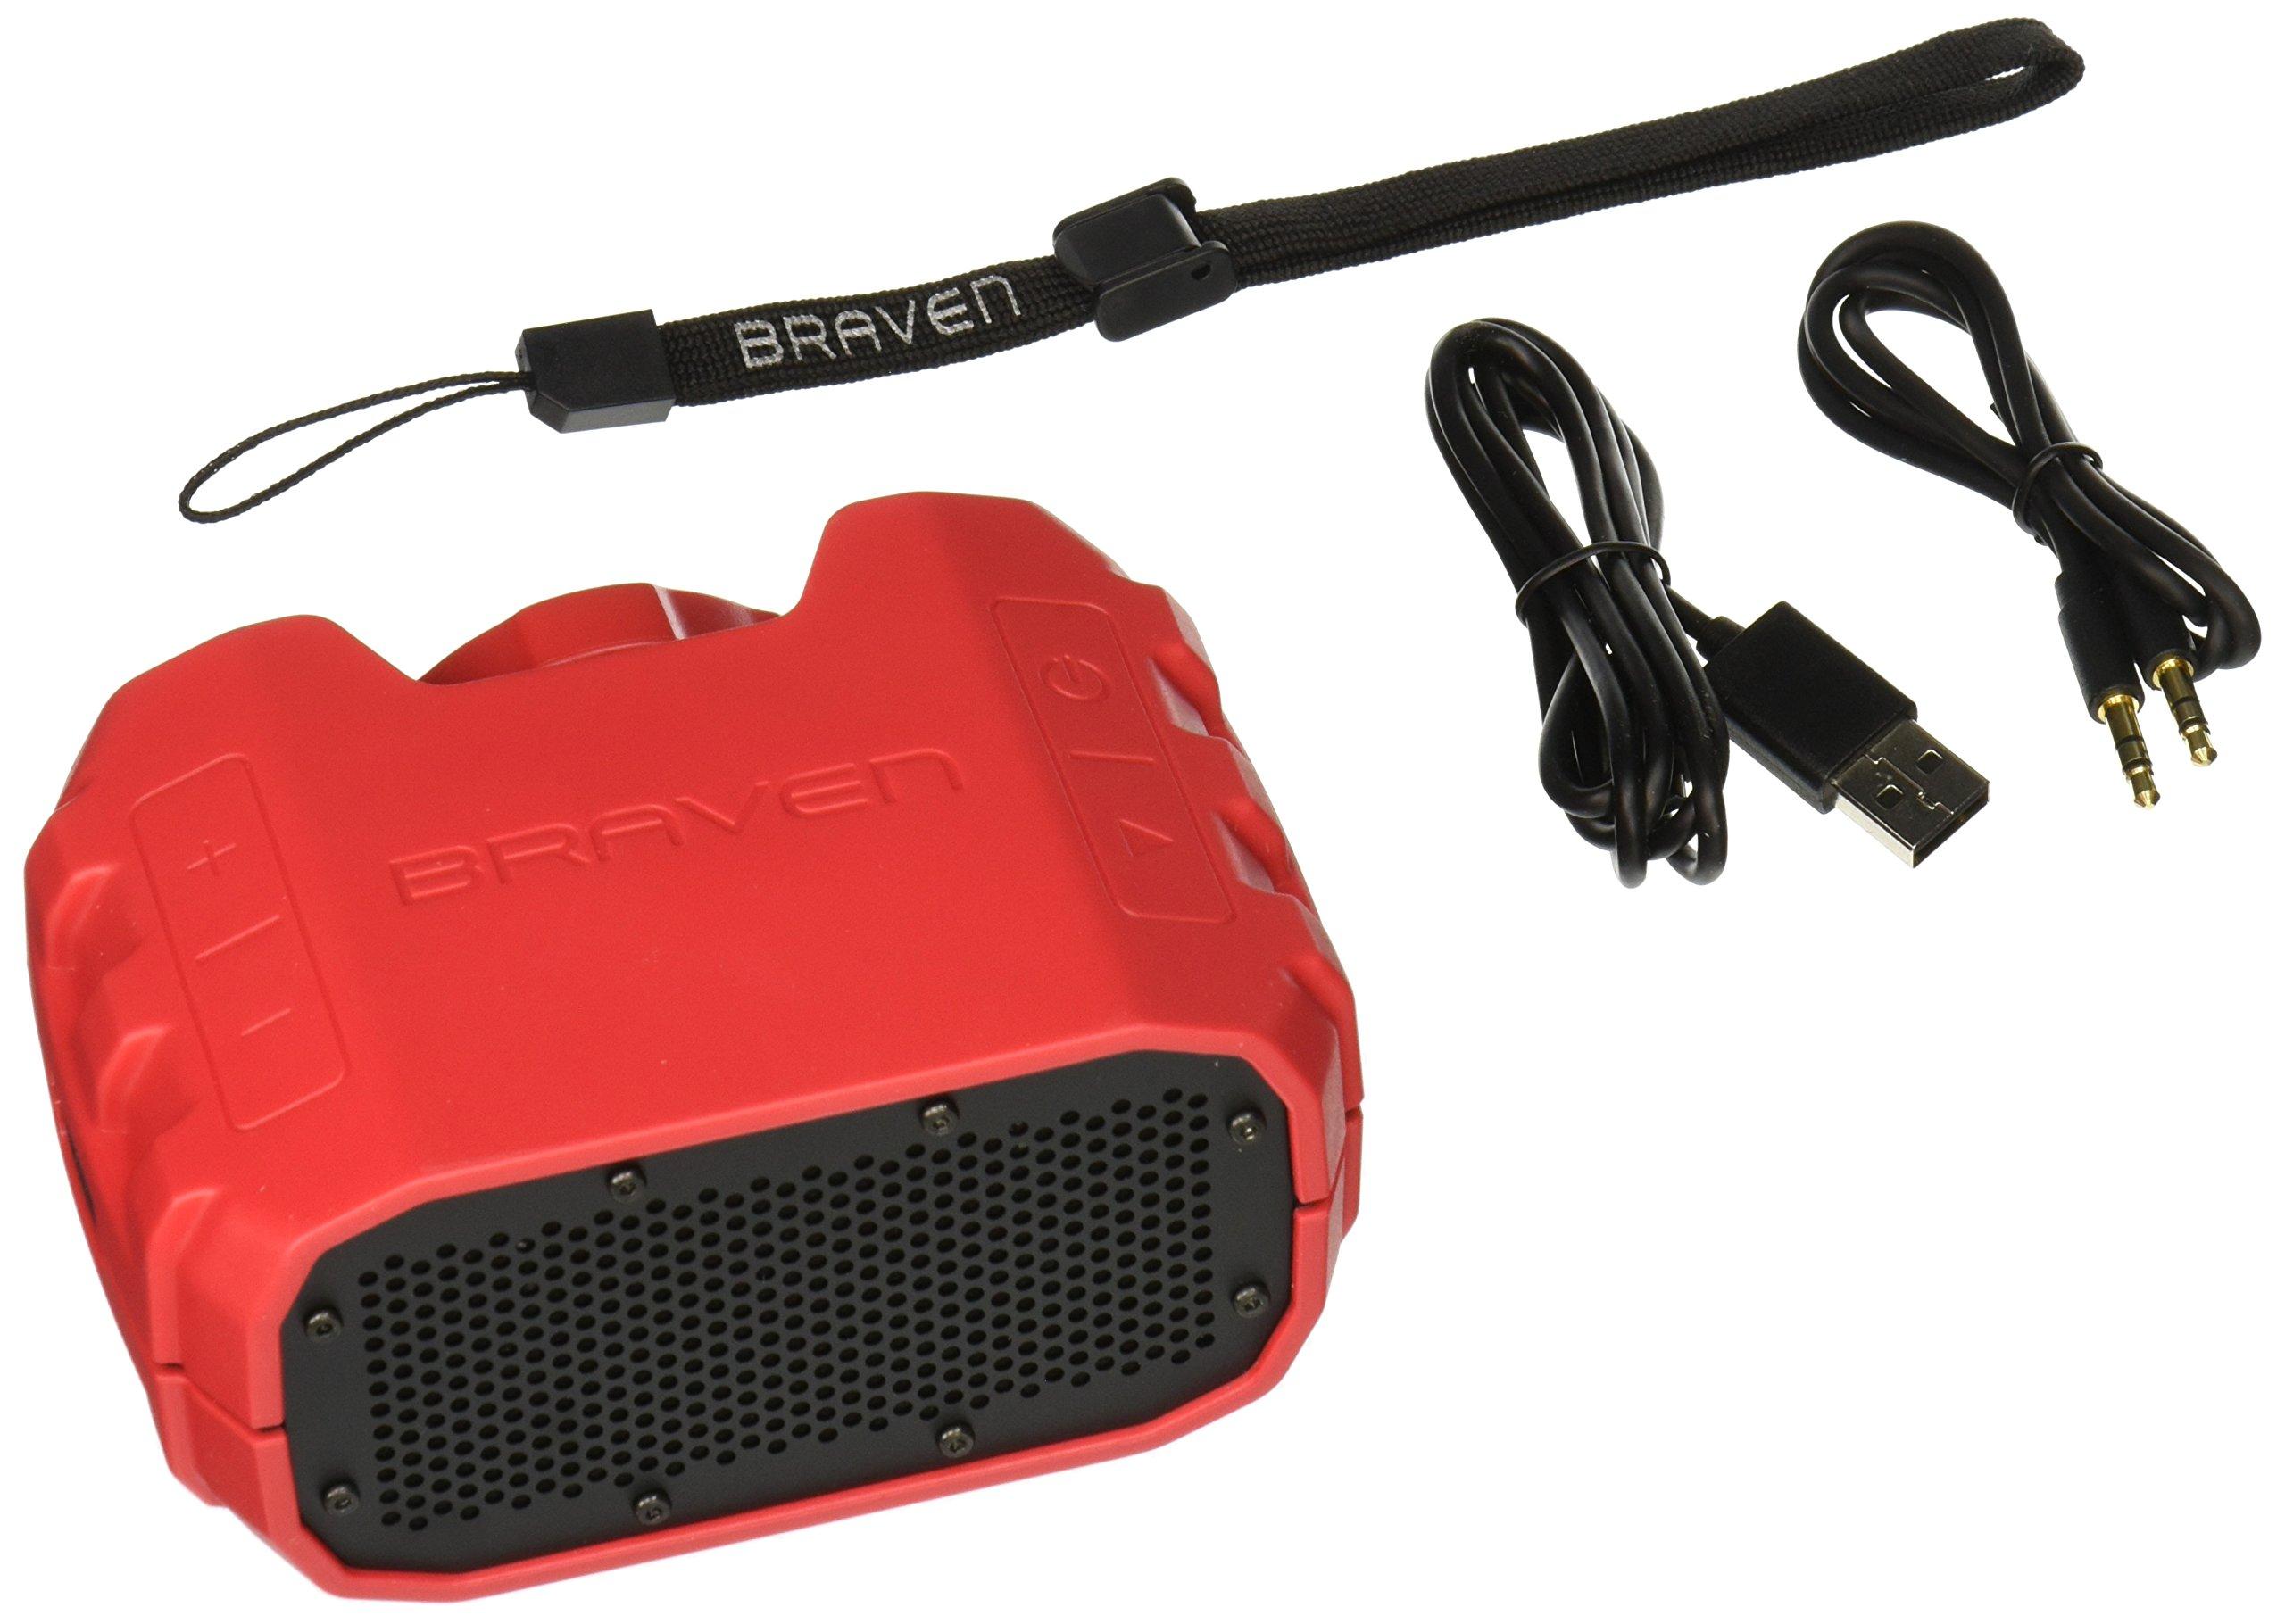 BRAVEN BRV-1 Portable Wireless Bluetooth Speaker [12 Hours][Waterproof] Built-in 1400 mAh Power Bank Charger- Red/Dark Gray by Braven